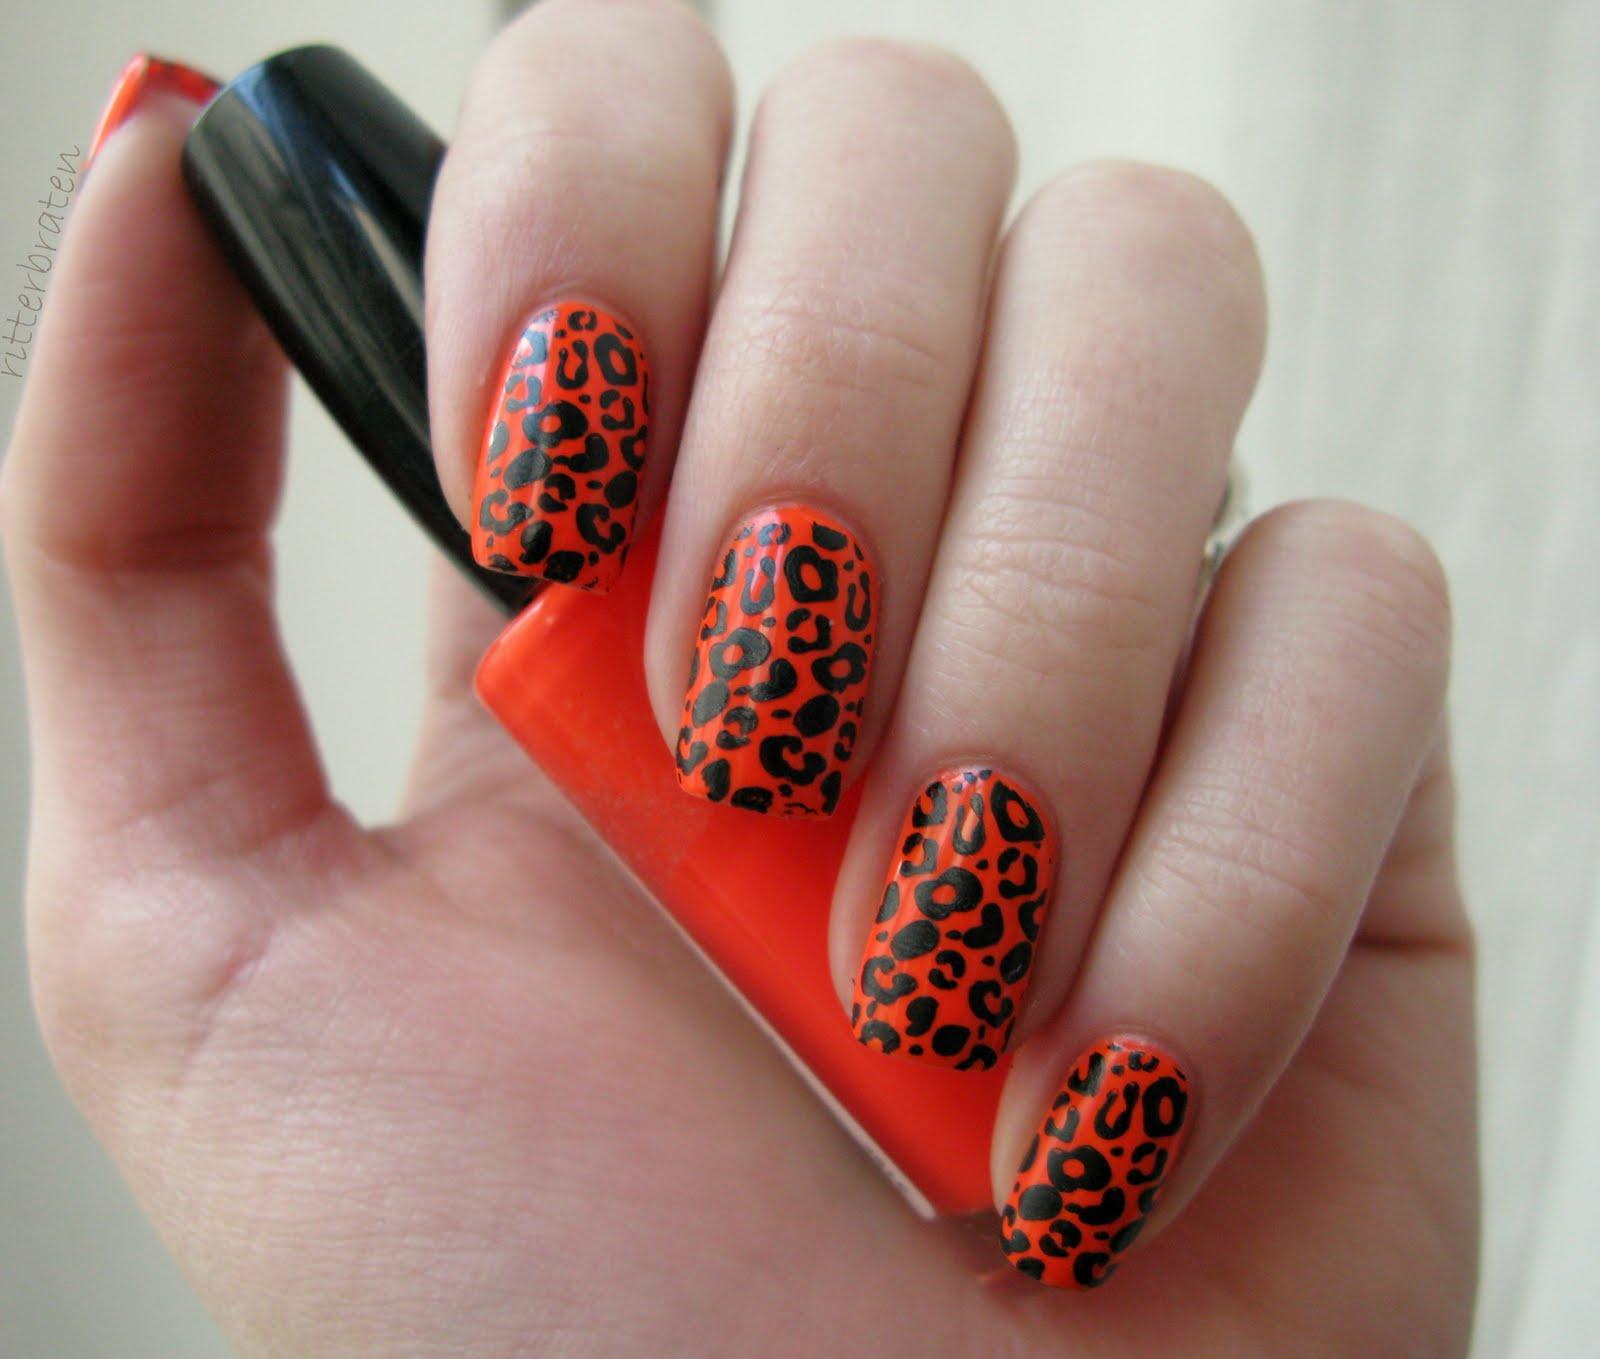 nageldesign fotogalerie - Fotogalerie RS Nails Mobiles Nagelstudio Ramona Spörke